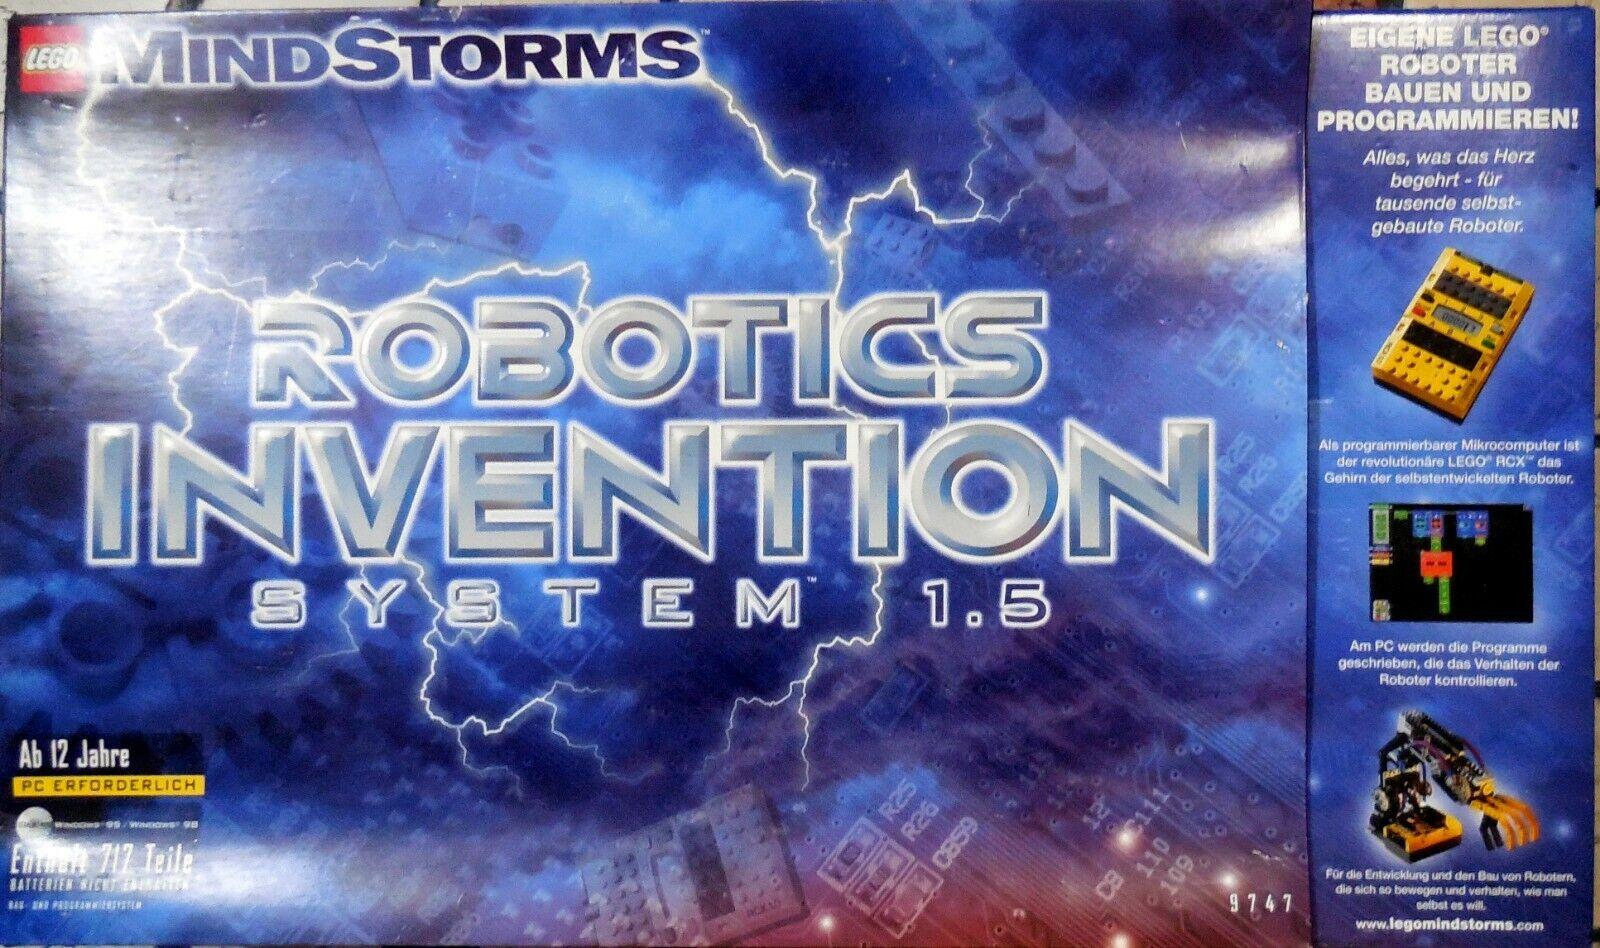 Lego 9747 Mind Storm Robotic invention System 1.5